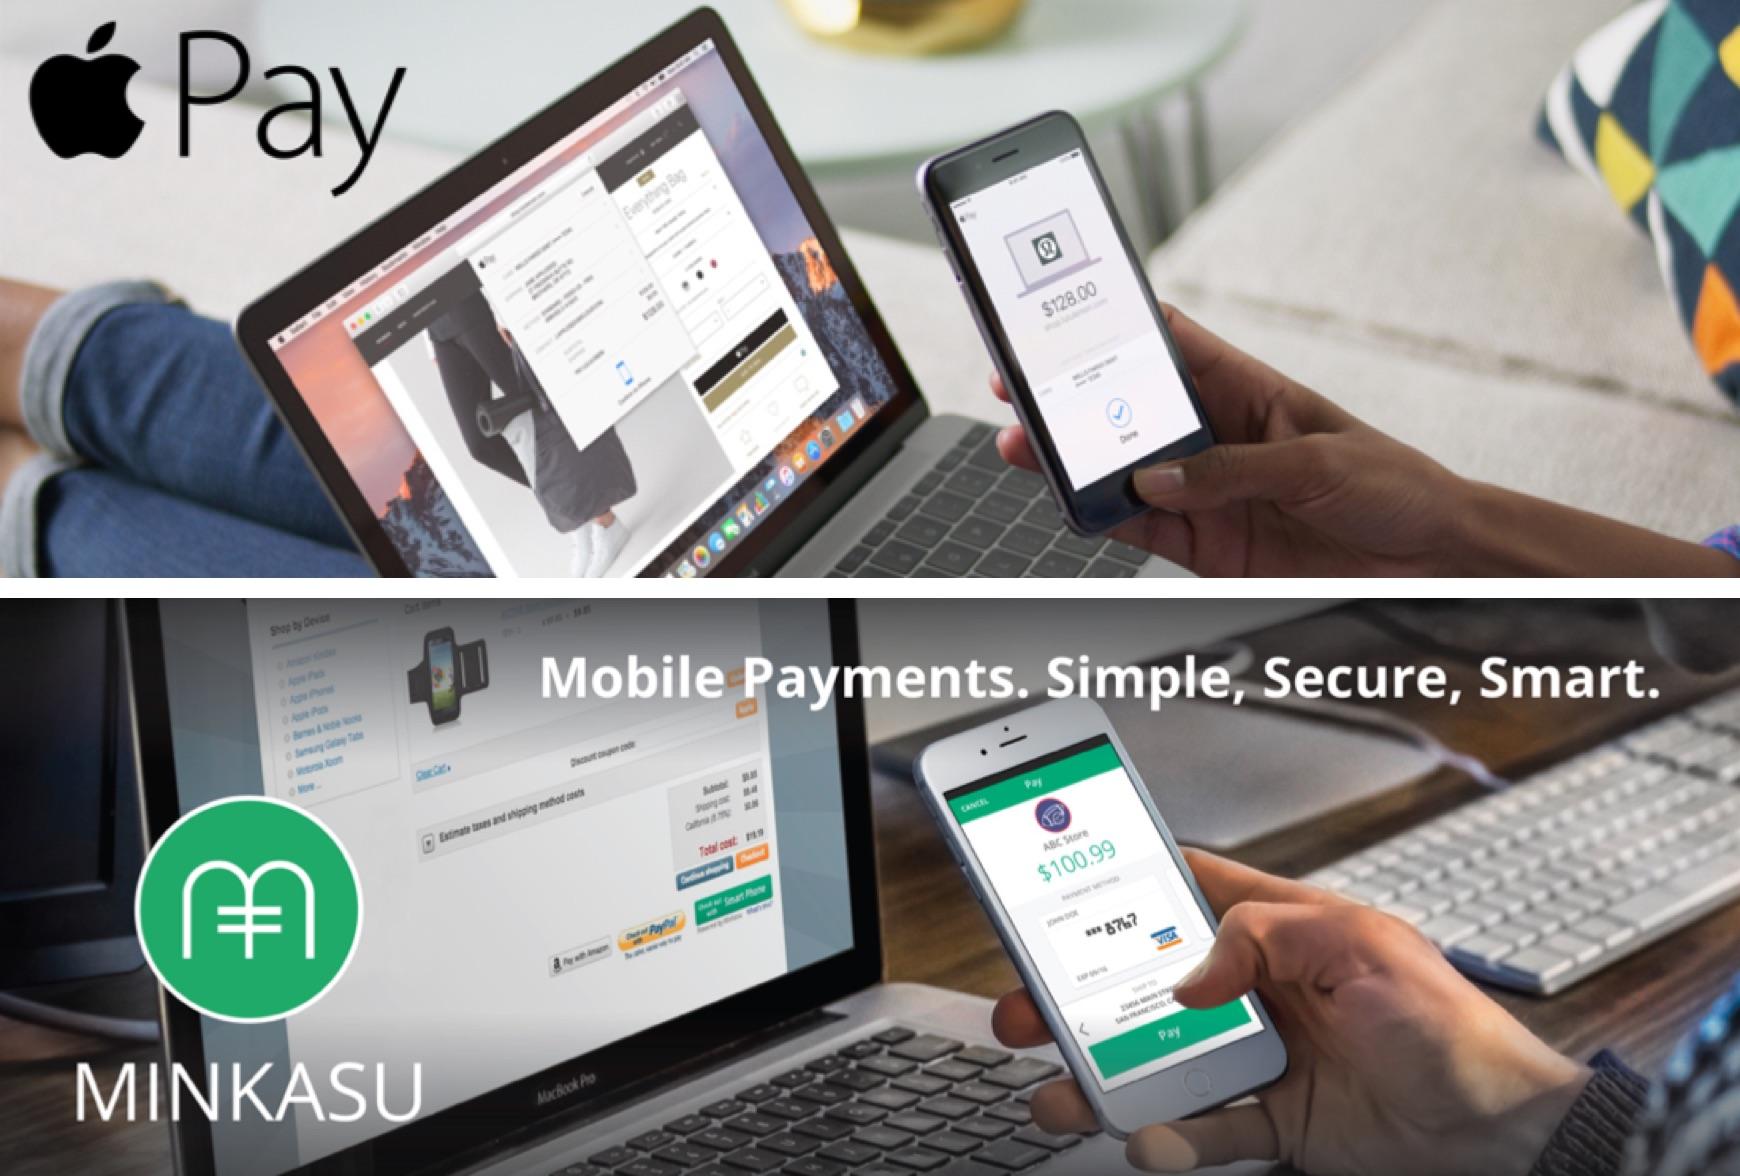 Apple pay vs Minkasu